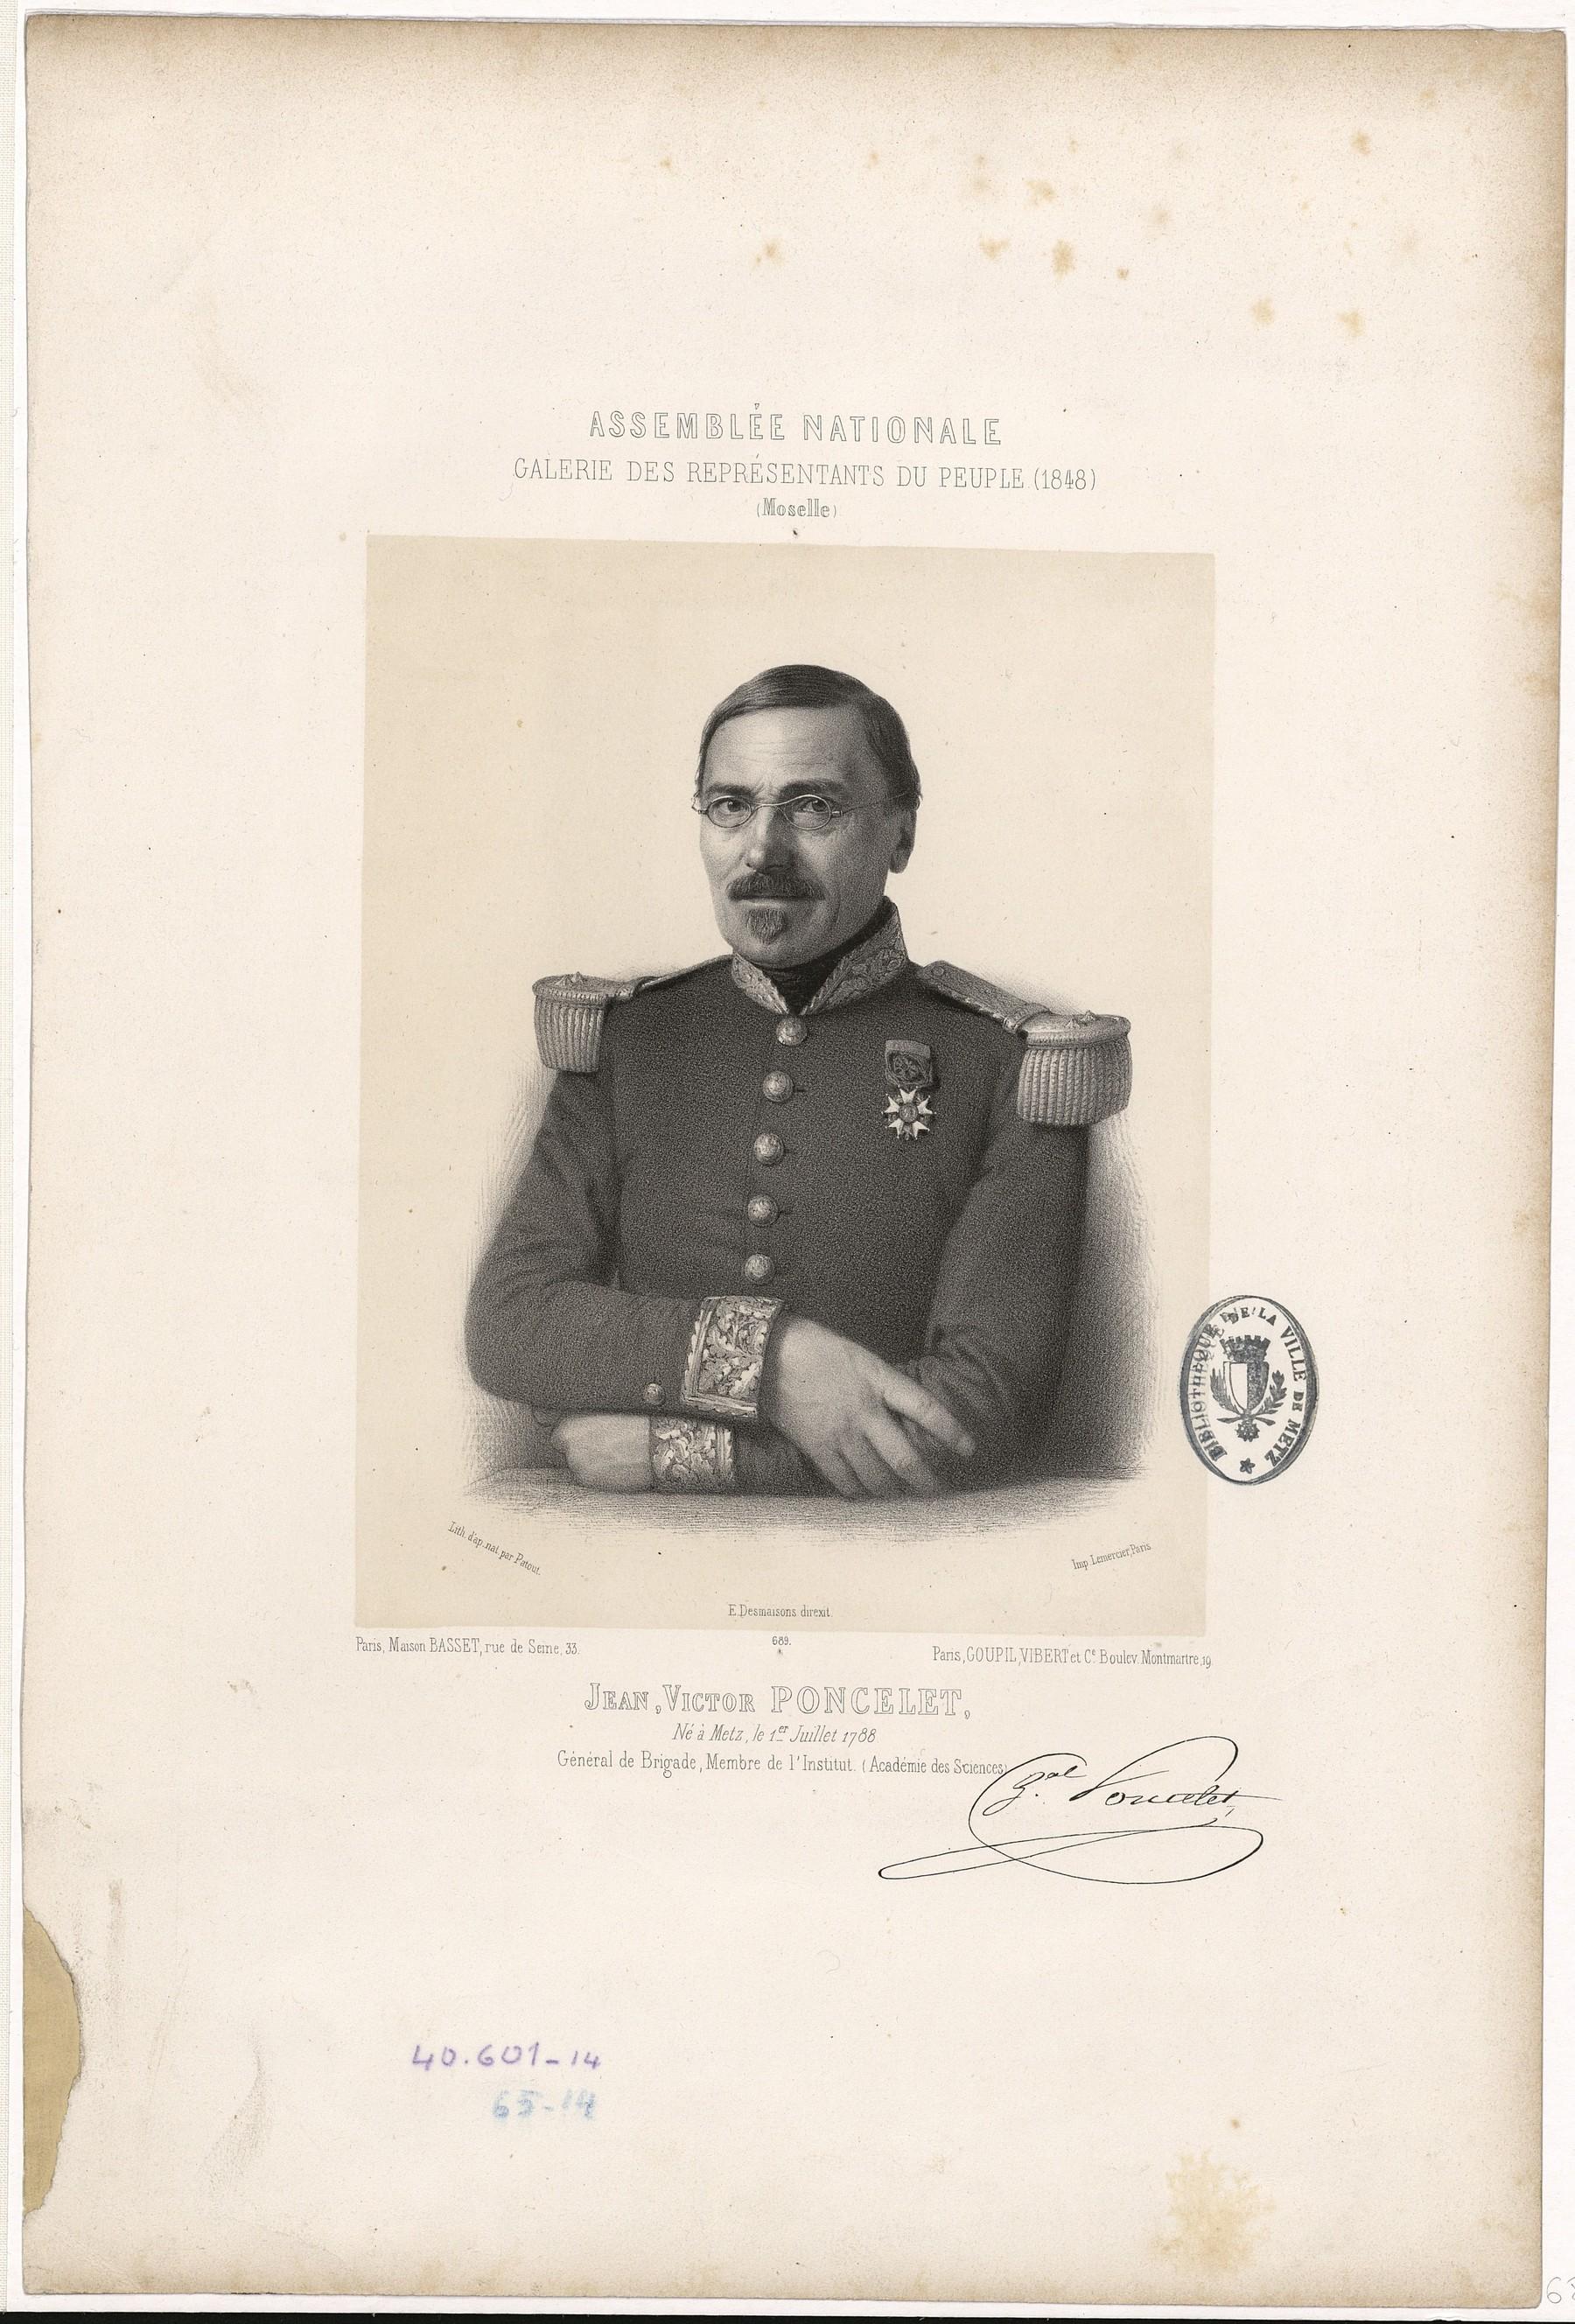 Contenu du Jean Victor Poncelet